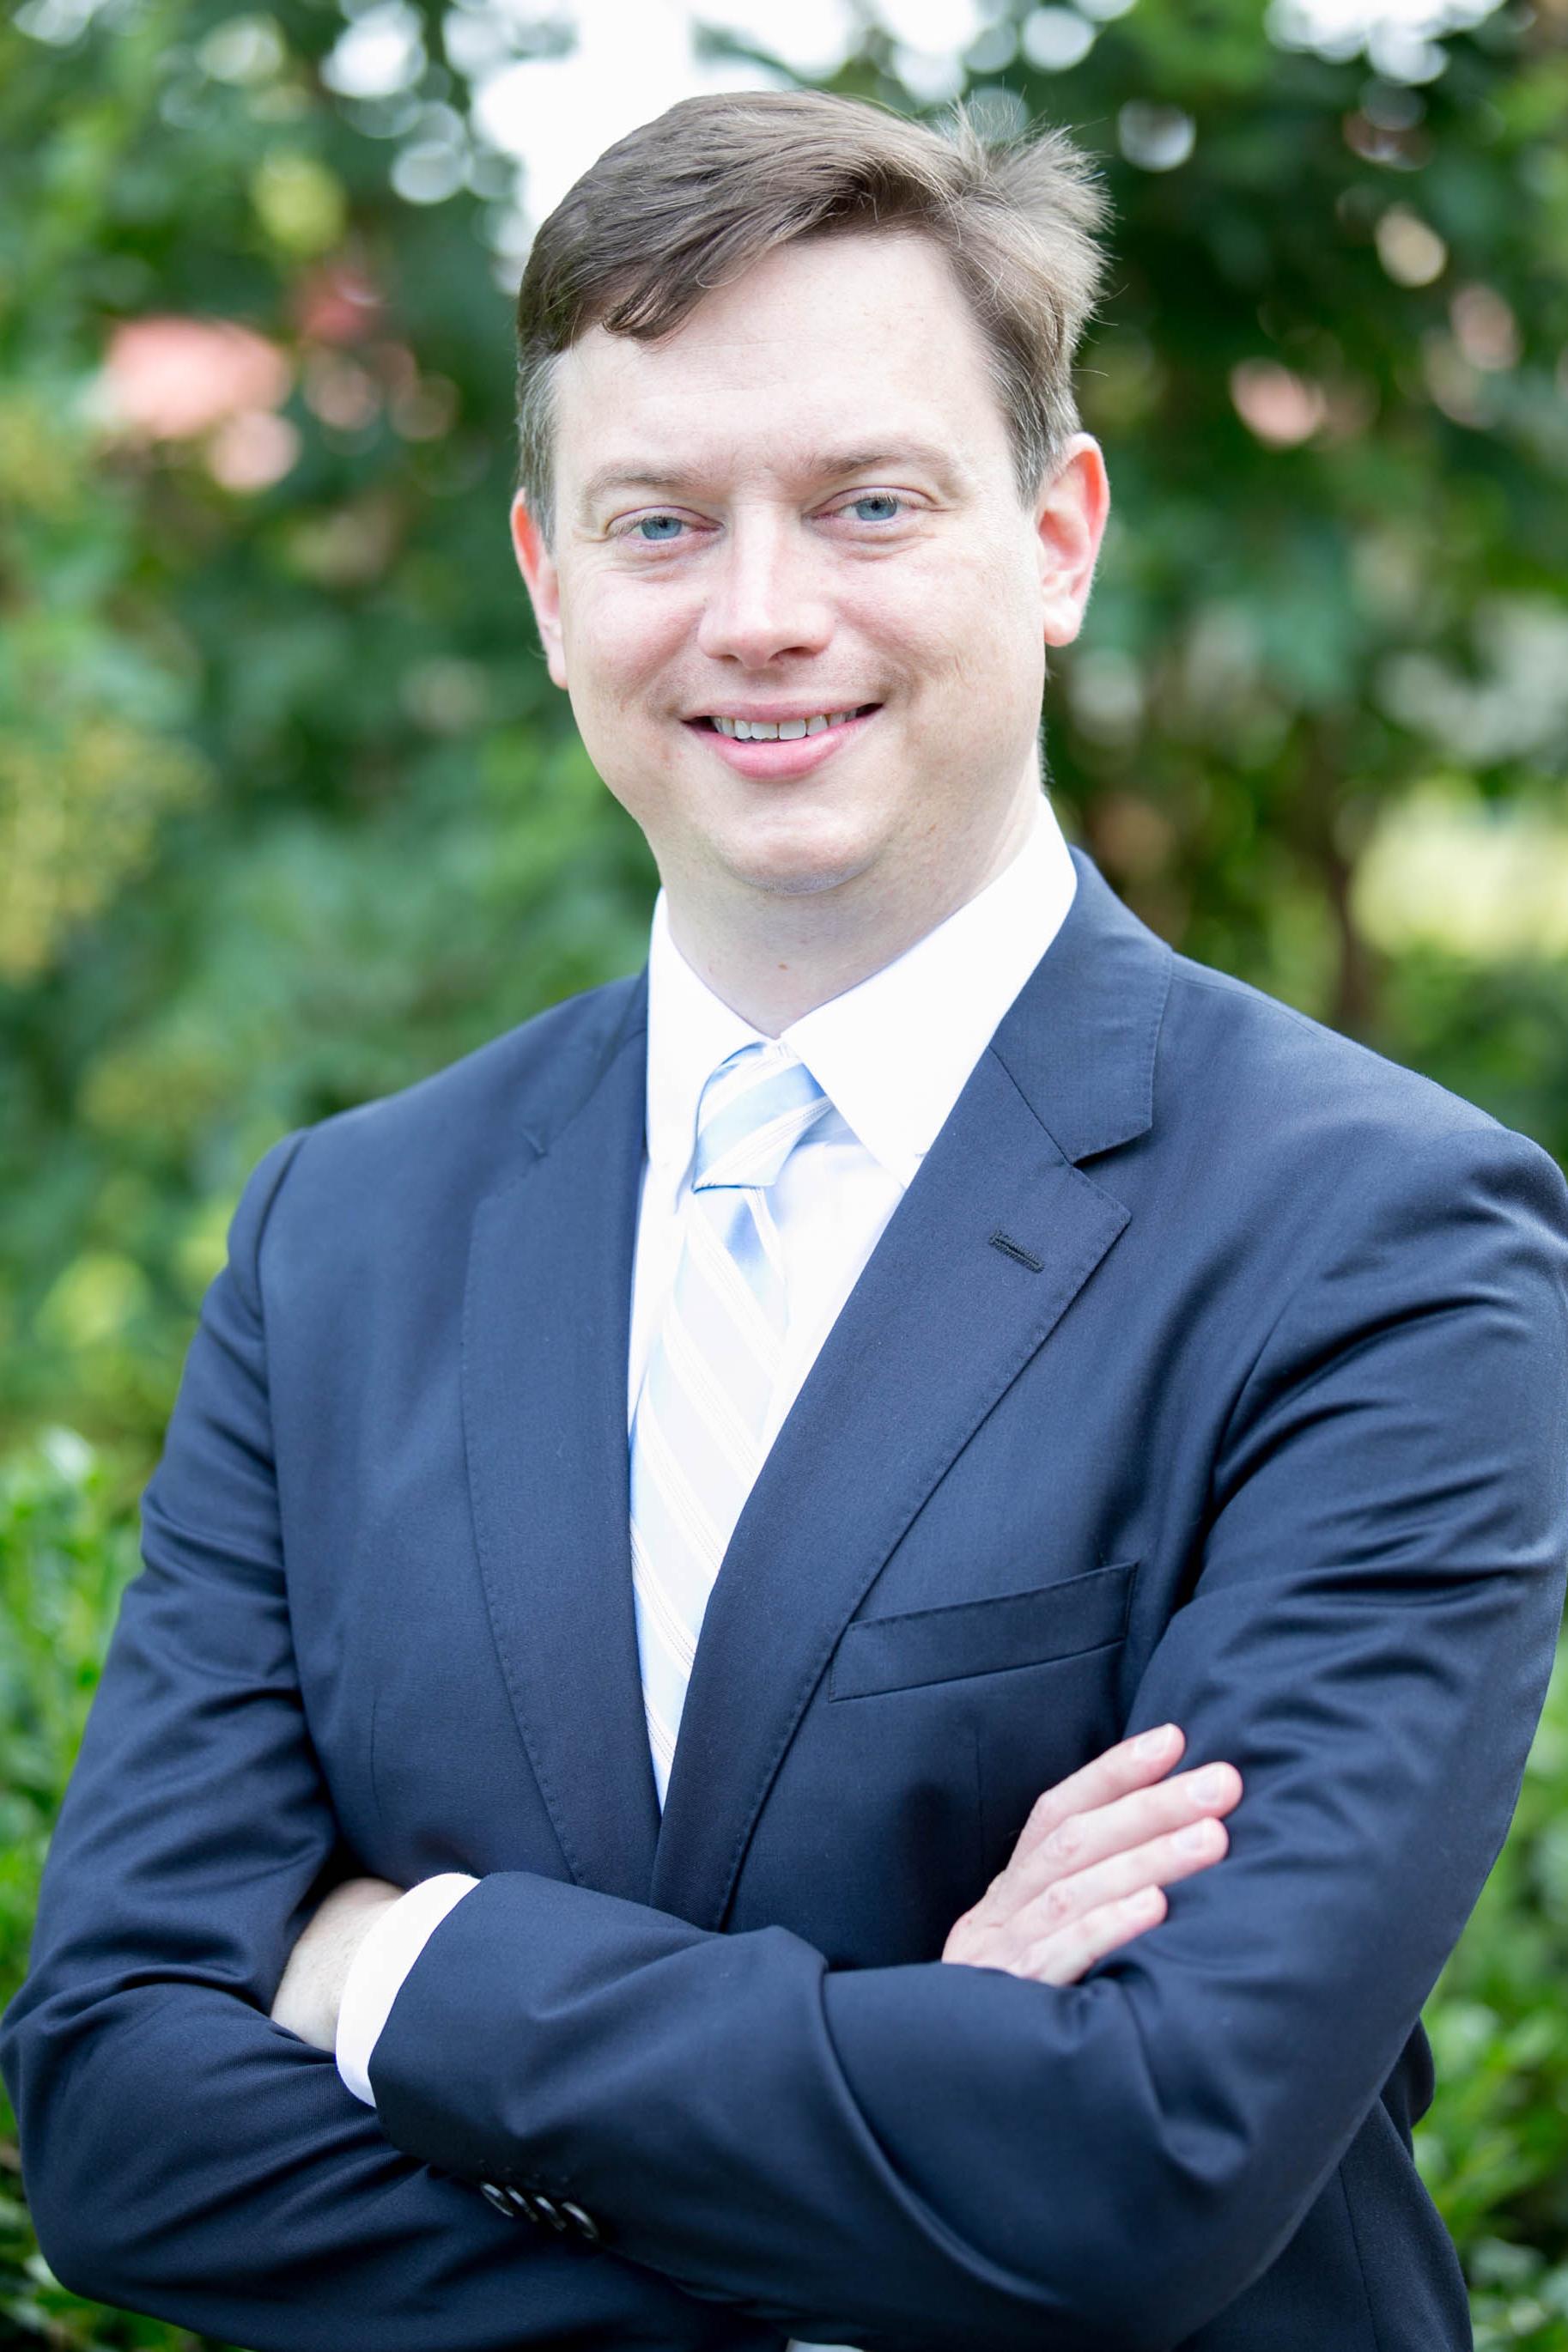 Nate Denny, Chief of Staff & Legislative Liaison